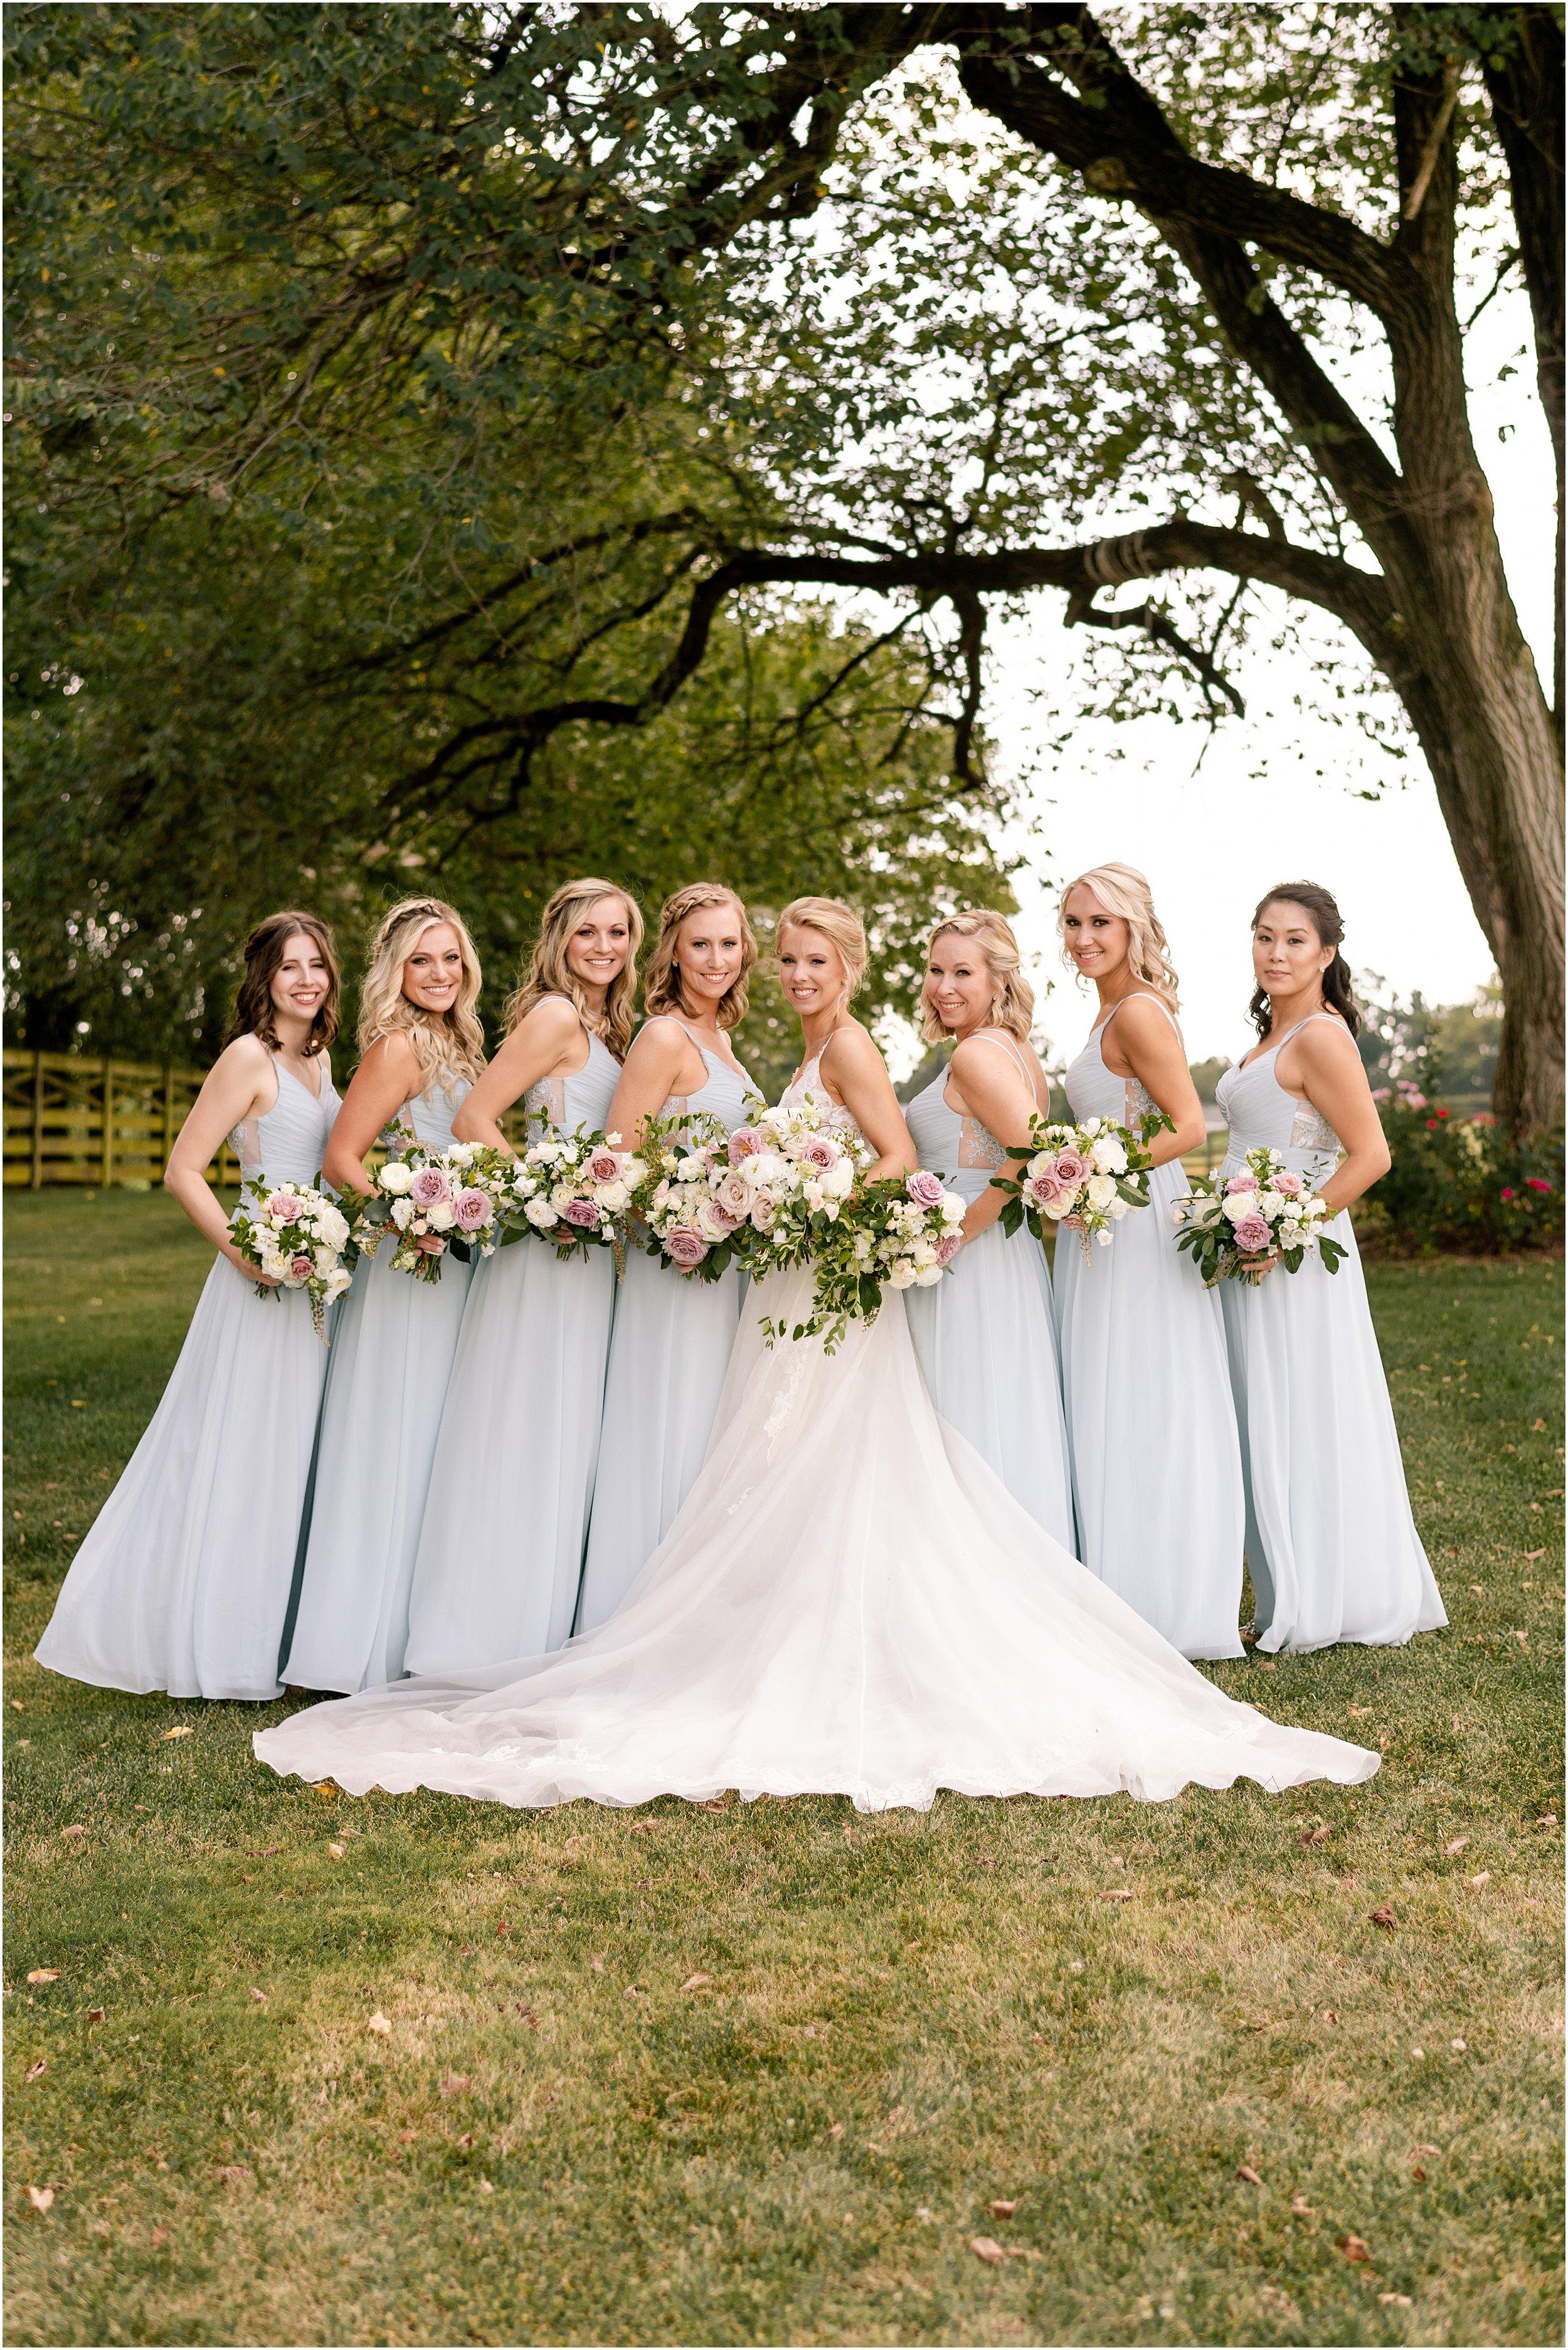 hannah leigh photography Walkers Overlook Wedding Walkersville MD_3520.jpg